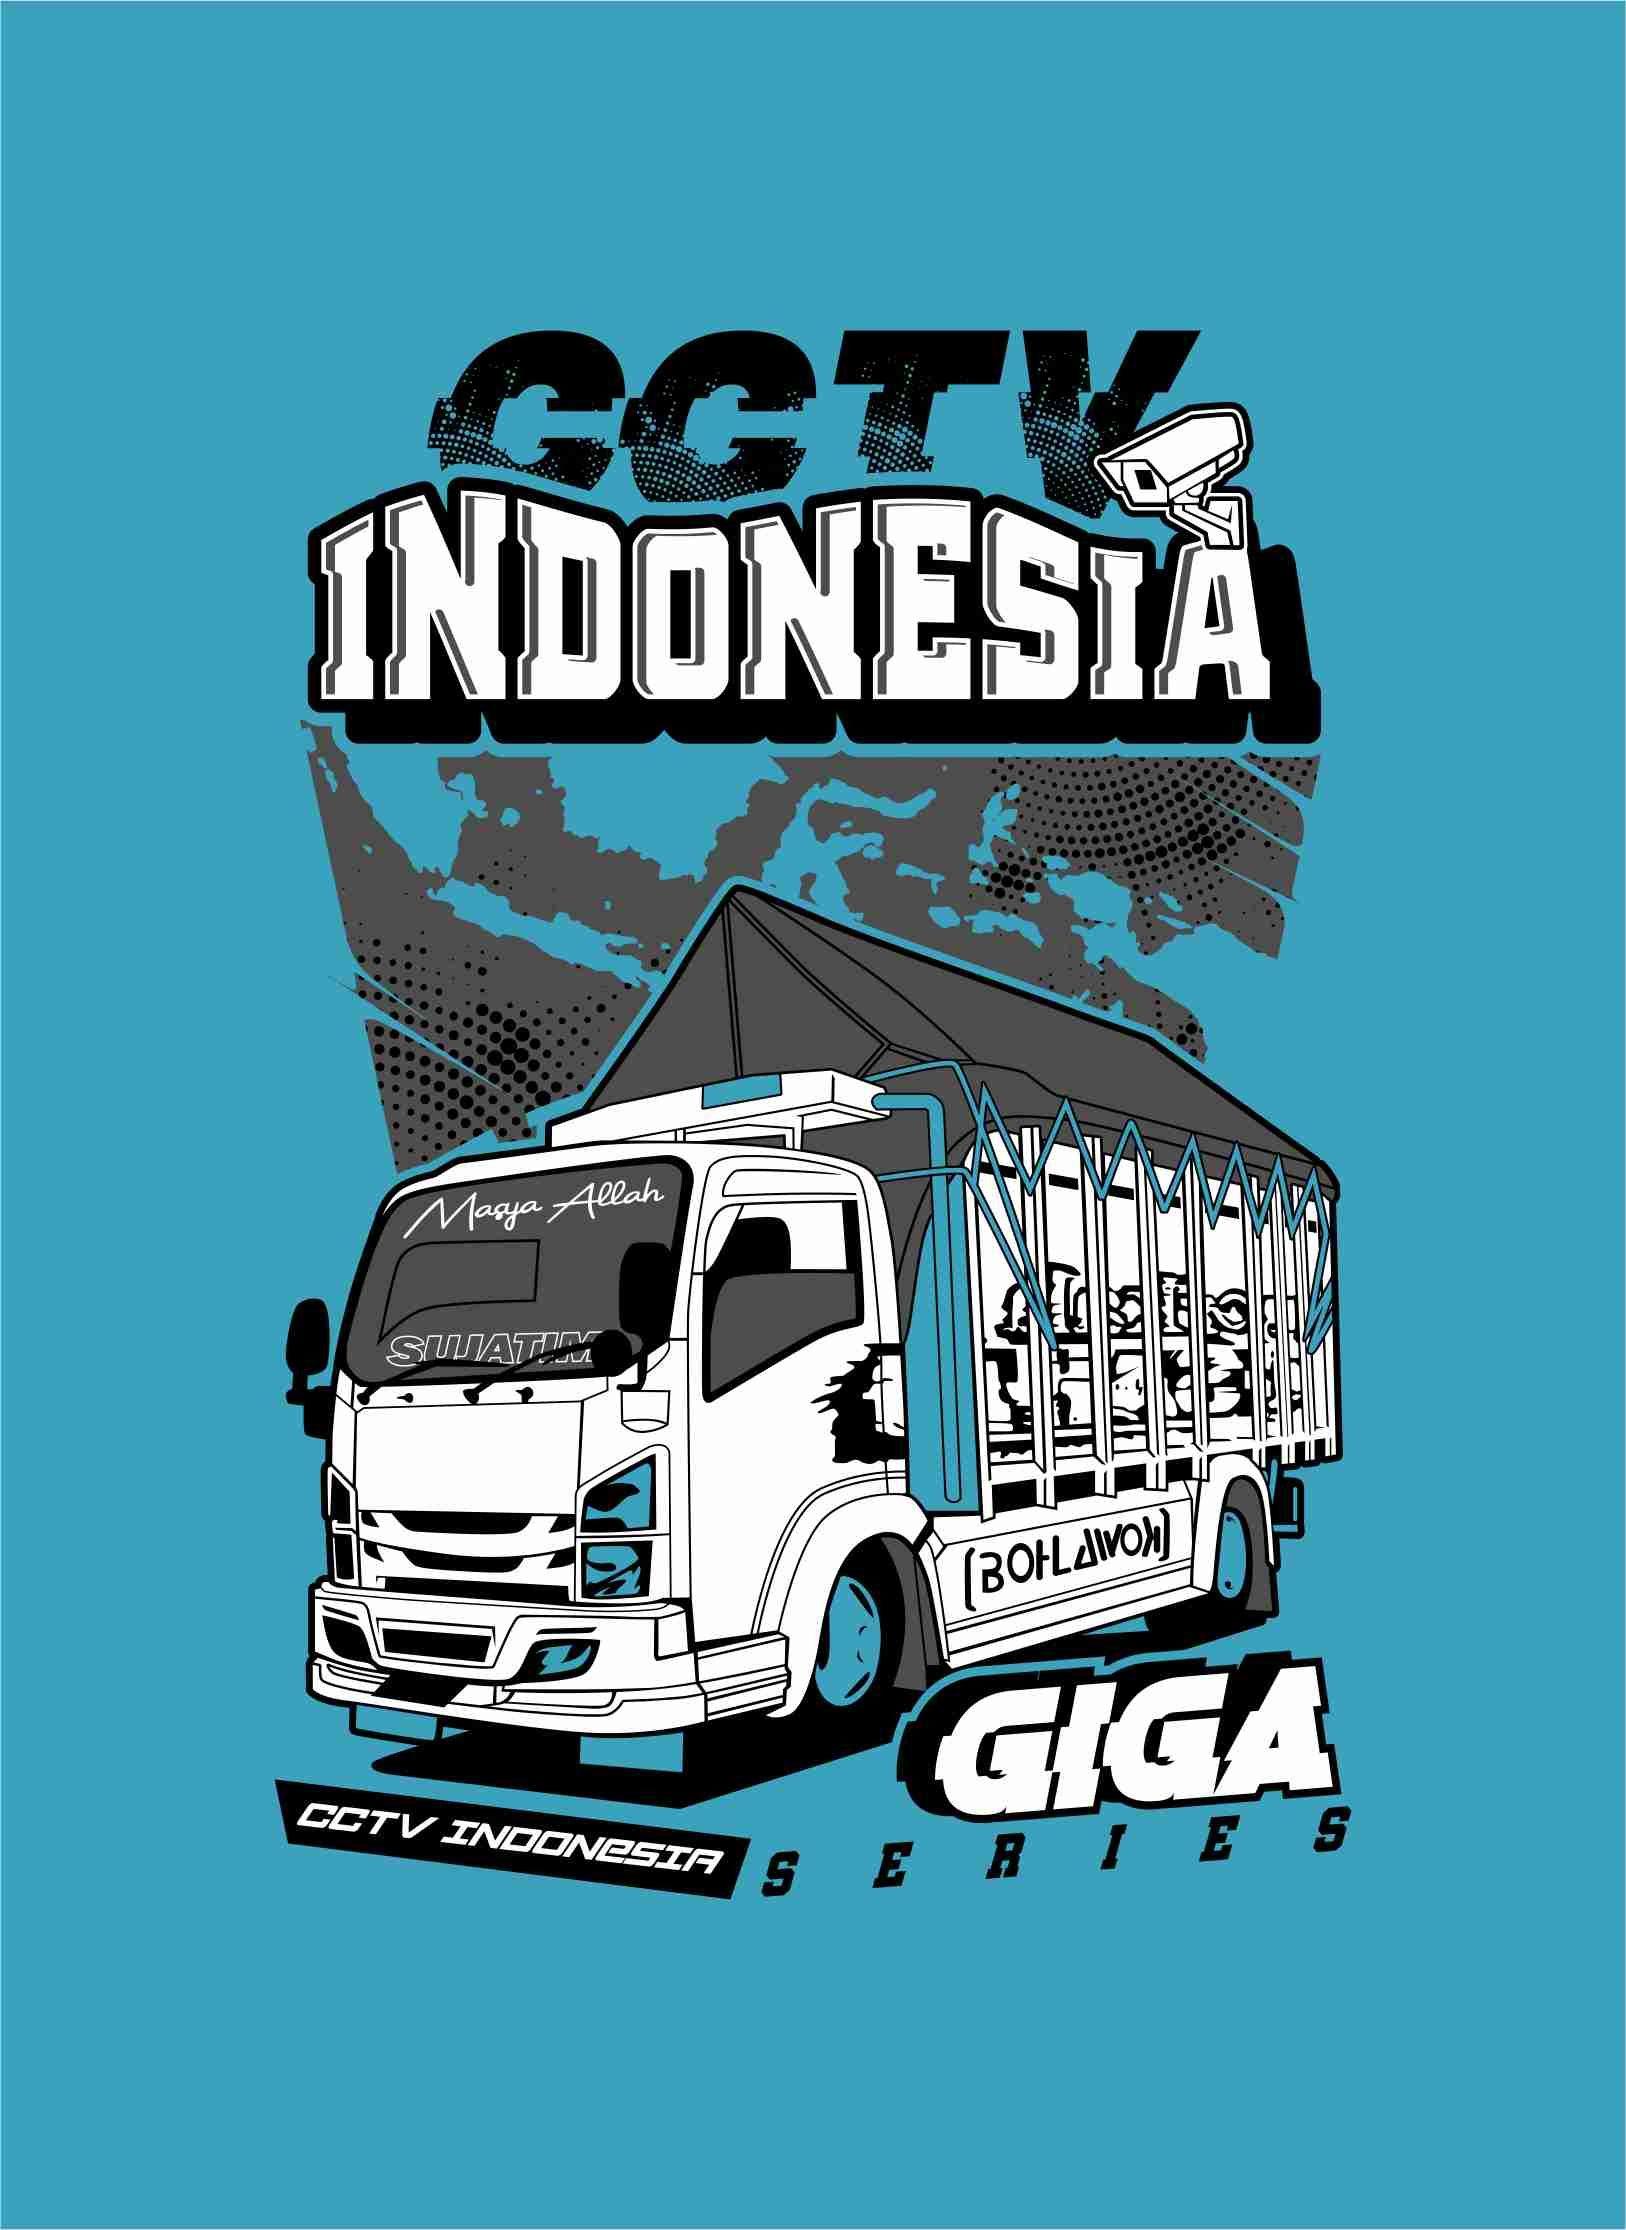 Truk Vector Cctv Indonesia Giga Series Desain Vektor Desain Logo Konsep Mobil